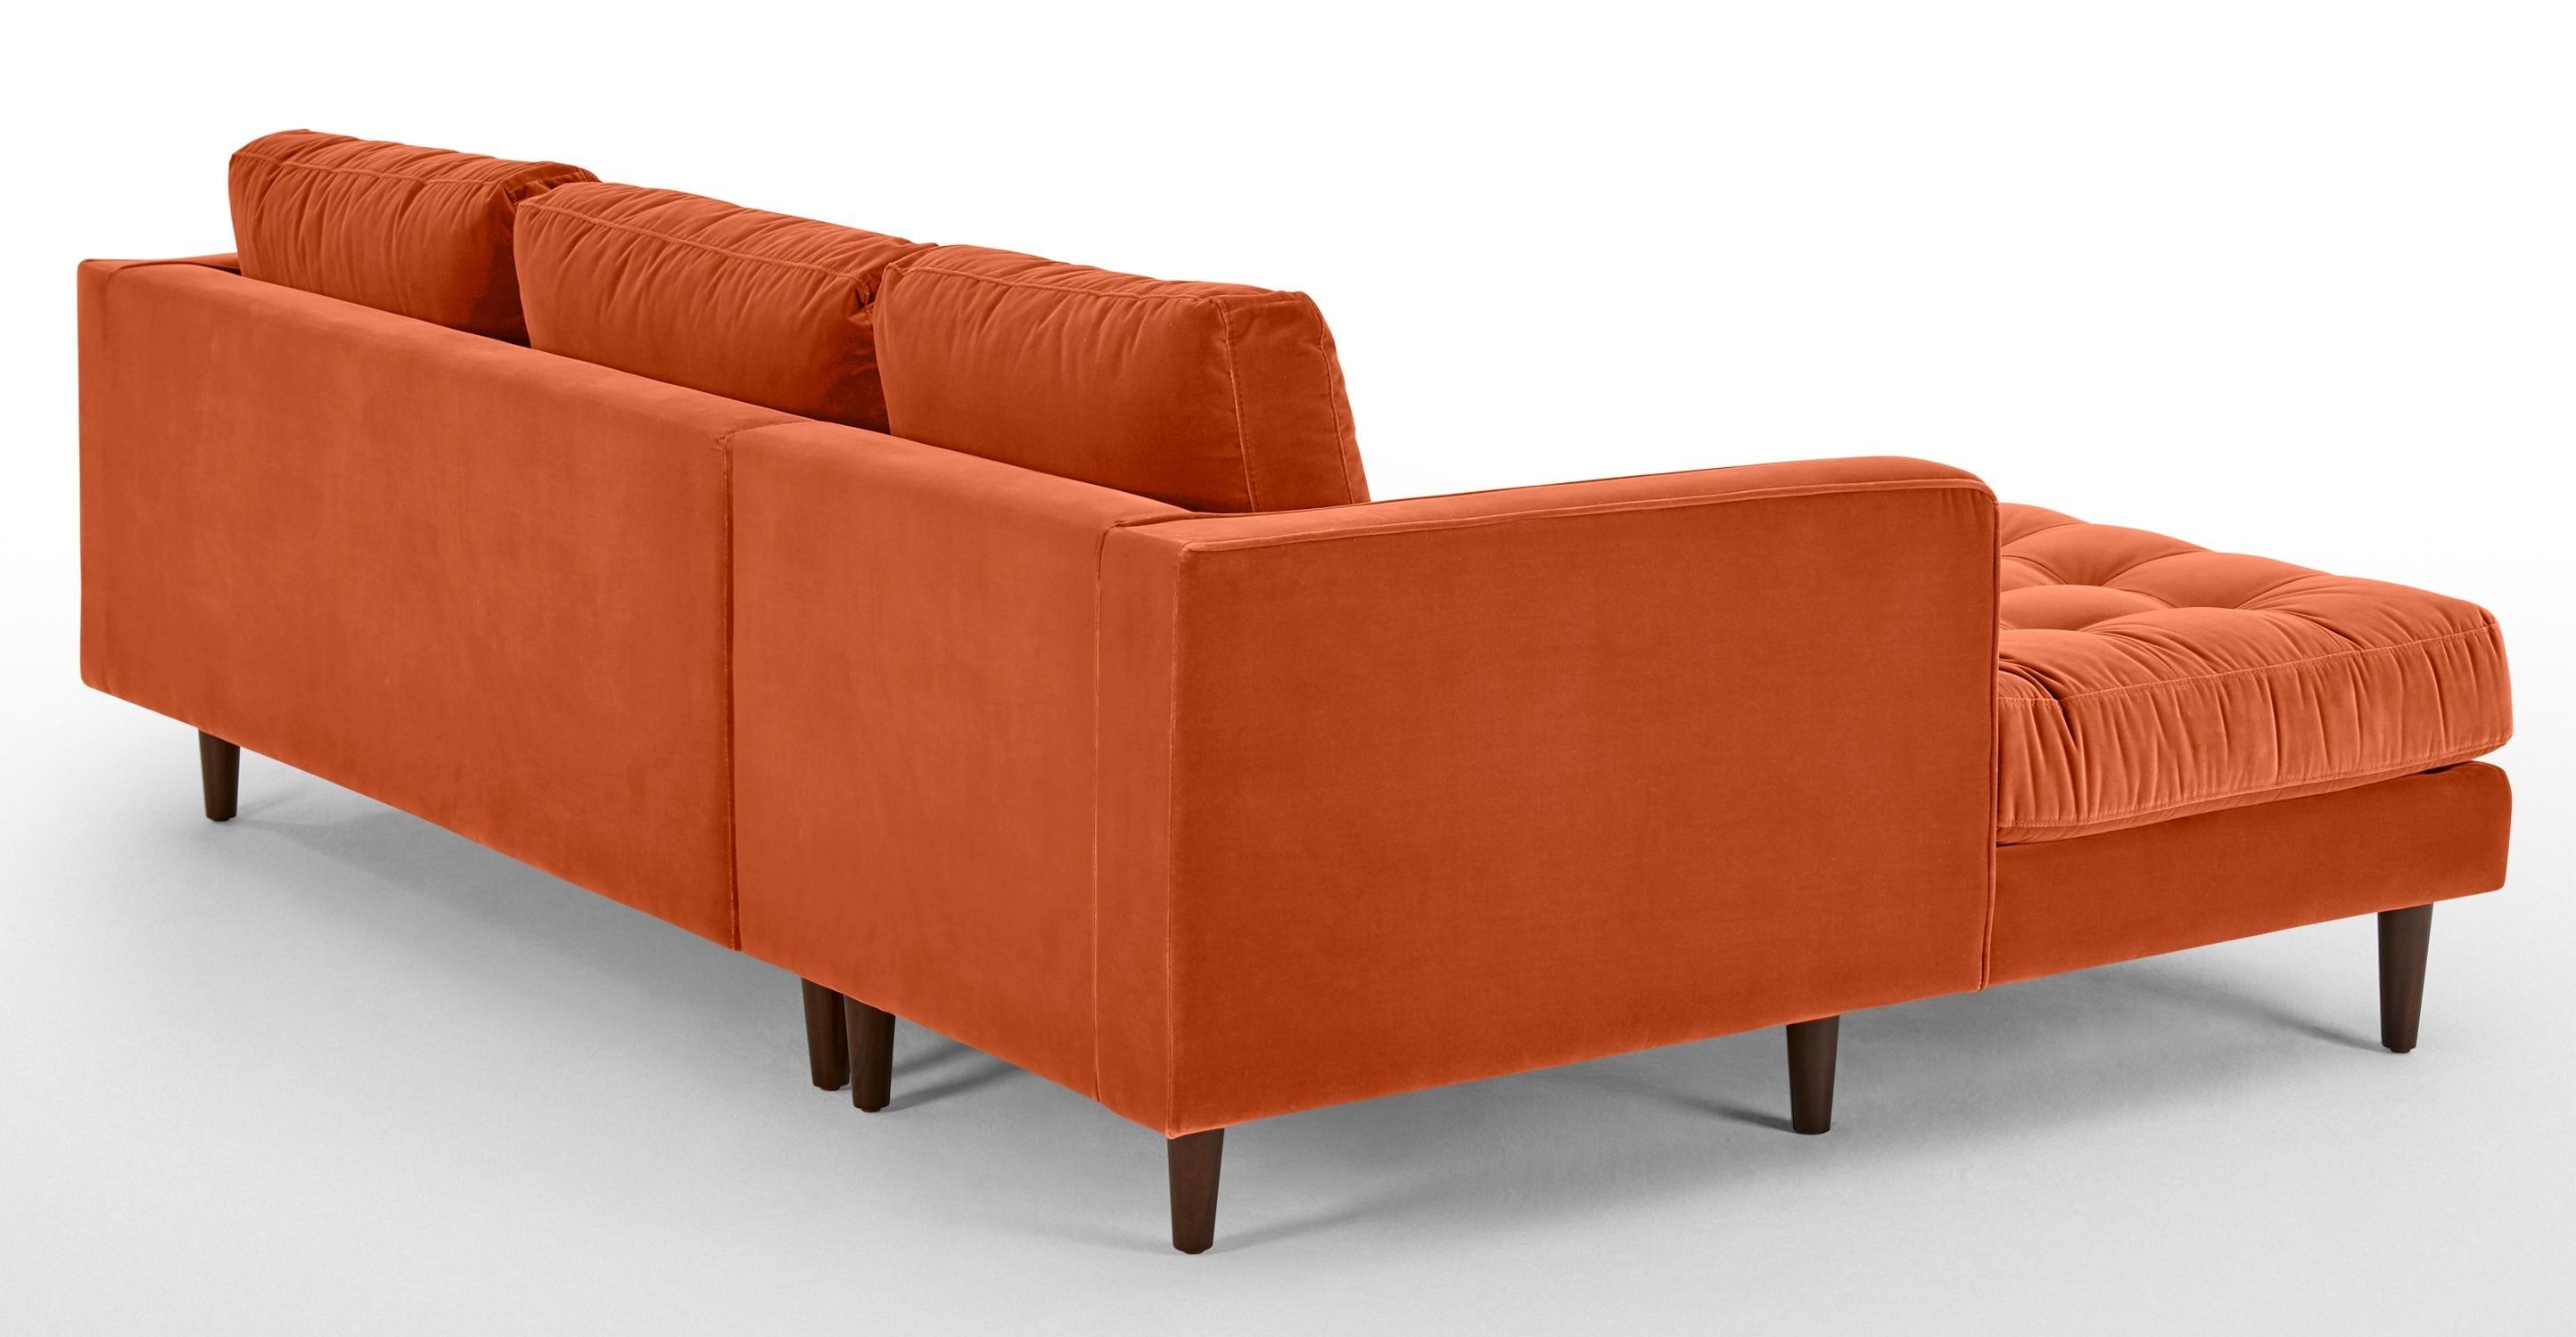 Scott 4 Seater Left Hand Facing Chaise End Sofa, Burnt Orange Within Burnt Orange Sofas (Image 16 of 20)